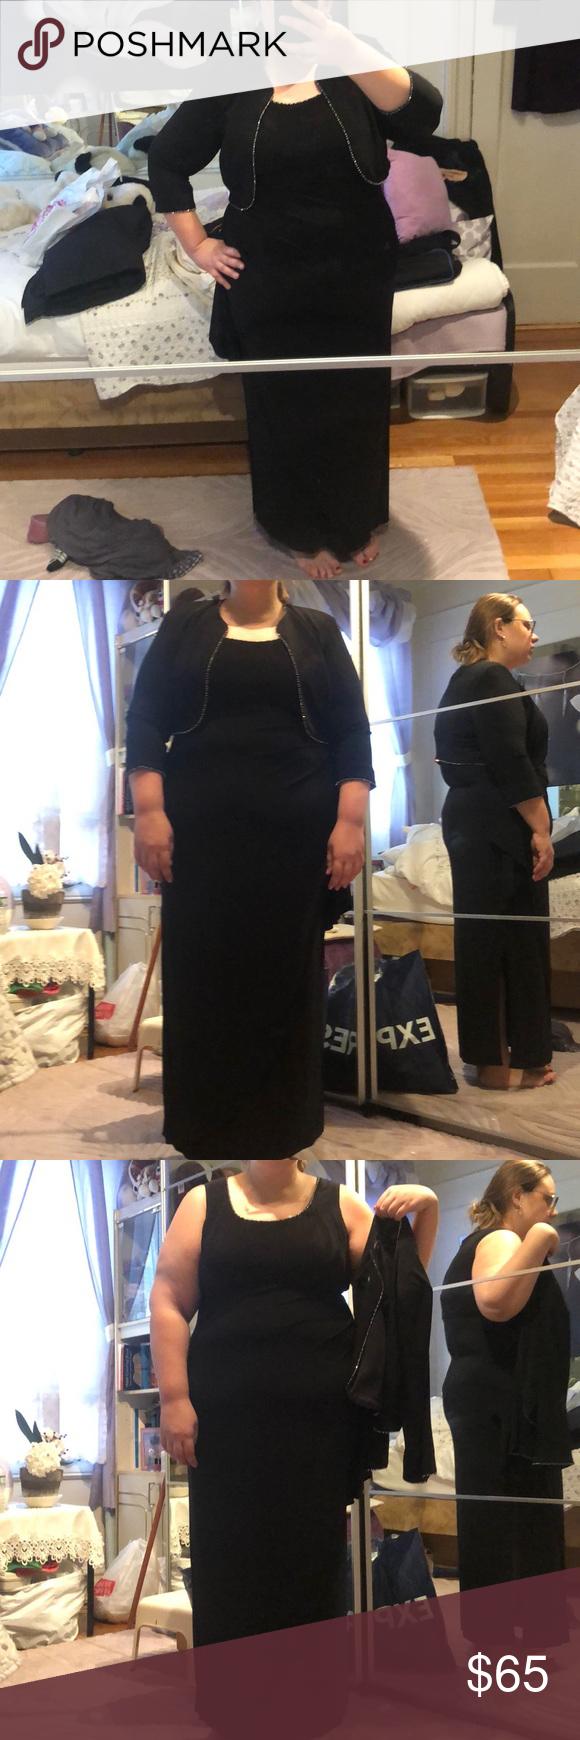 Black Elegant Long Black Dress With Cover Up Long Black Dress Black Dress Clothes Design [ 1740 x 580 Pixel ]